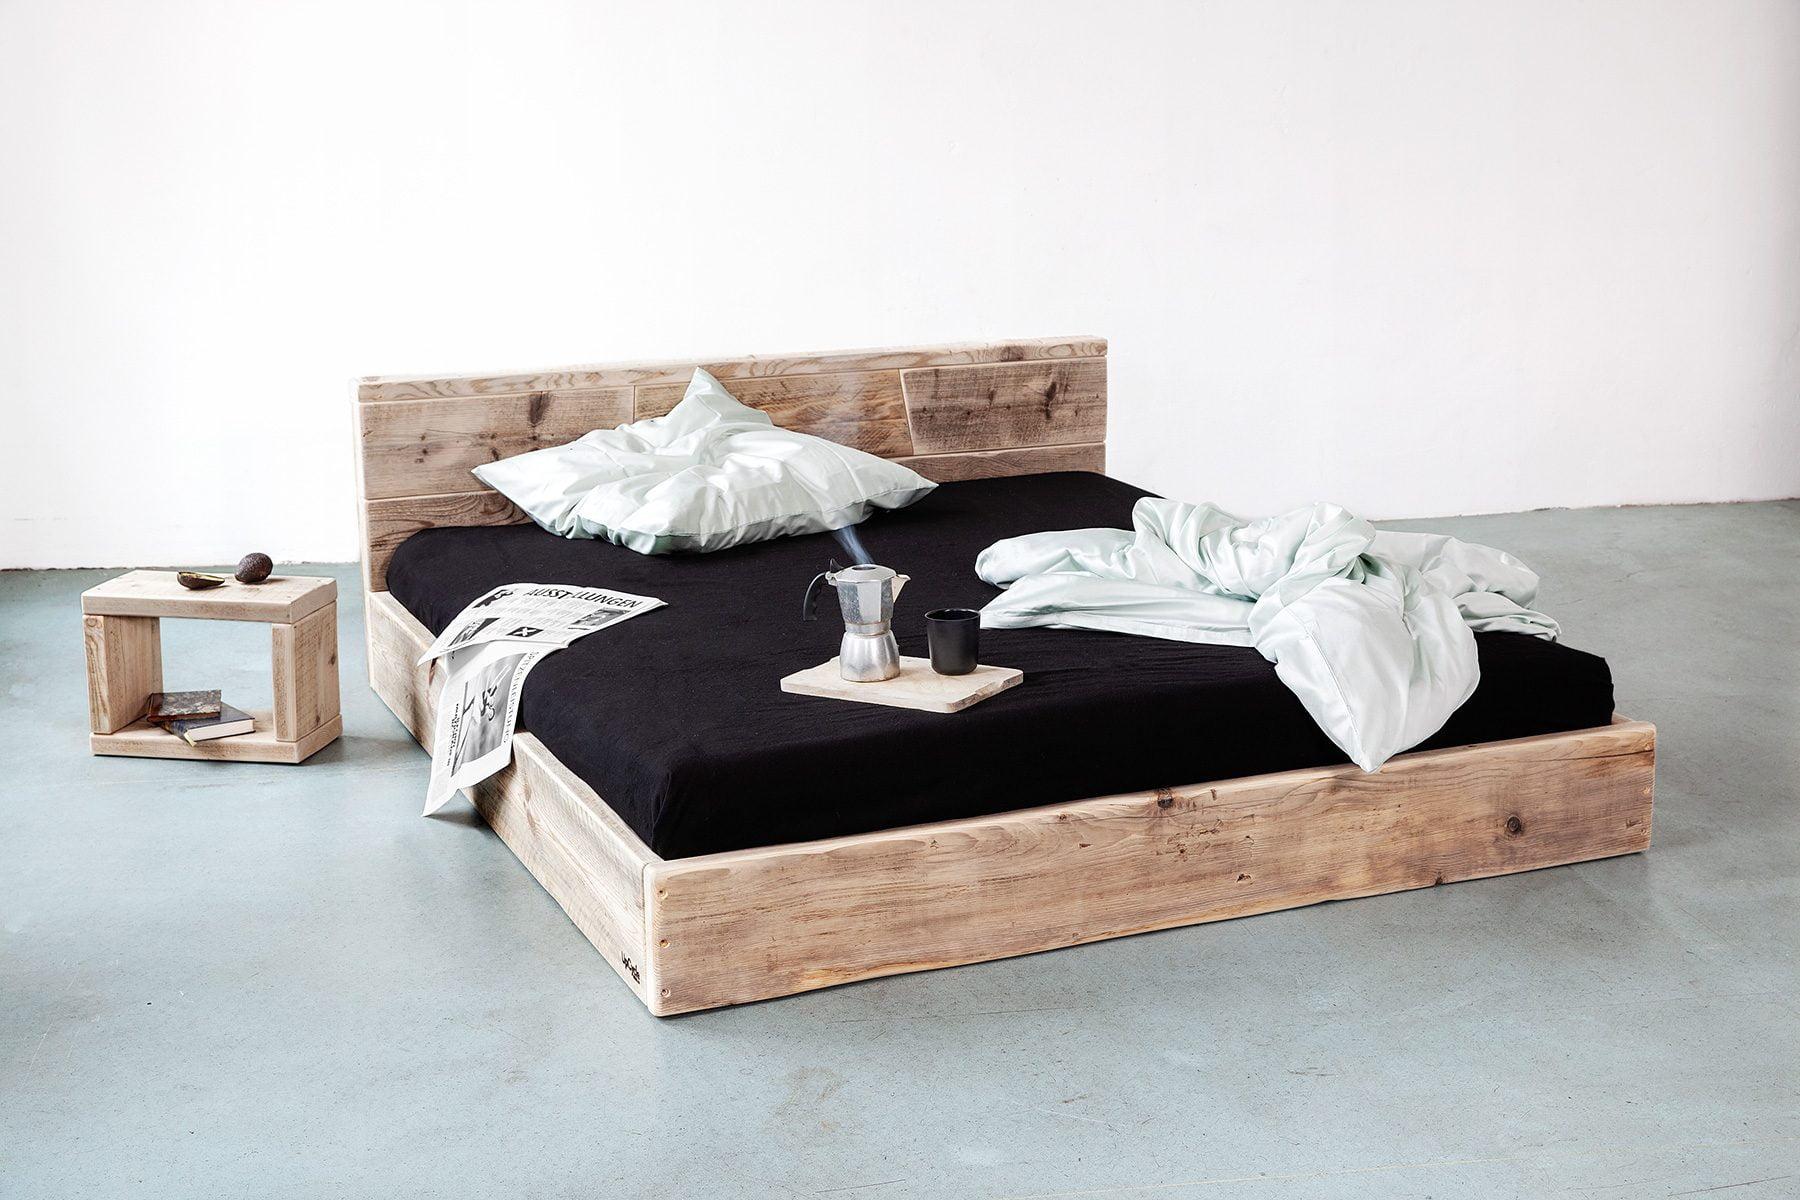 Massivholz Bett mit Lehne aus Bauholz nach Mass UpCycle Berlin